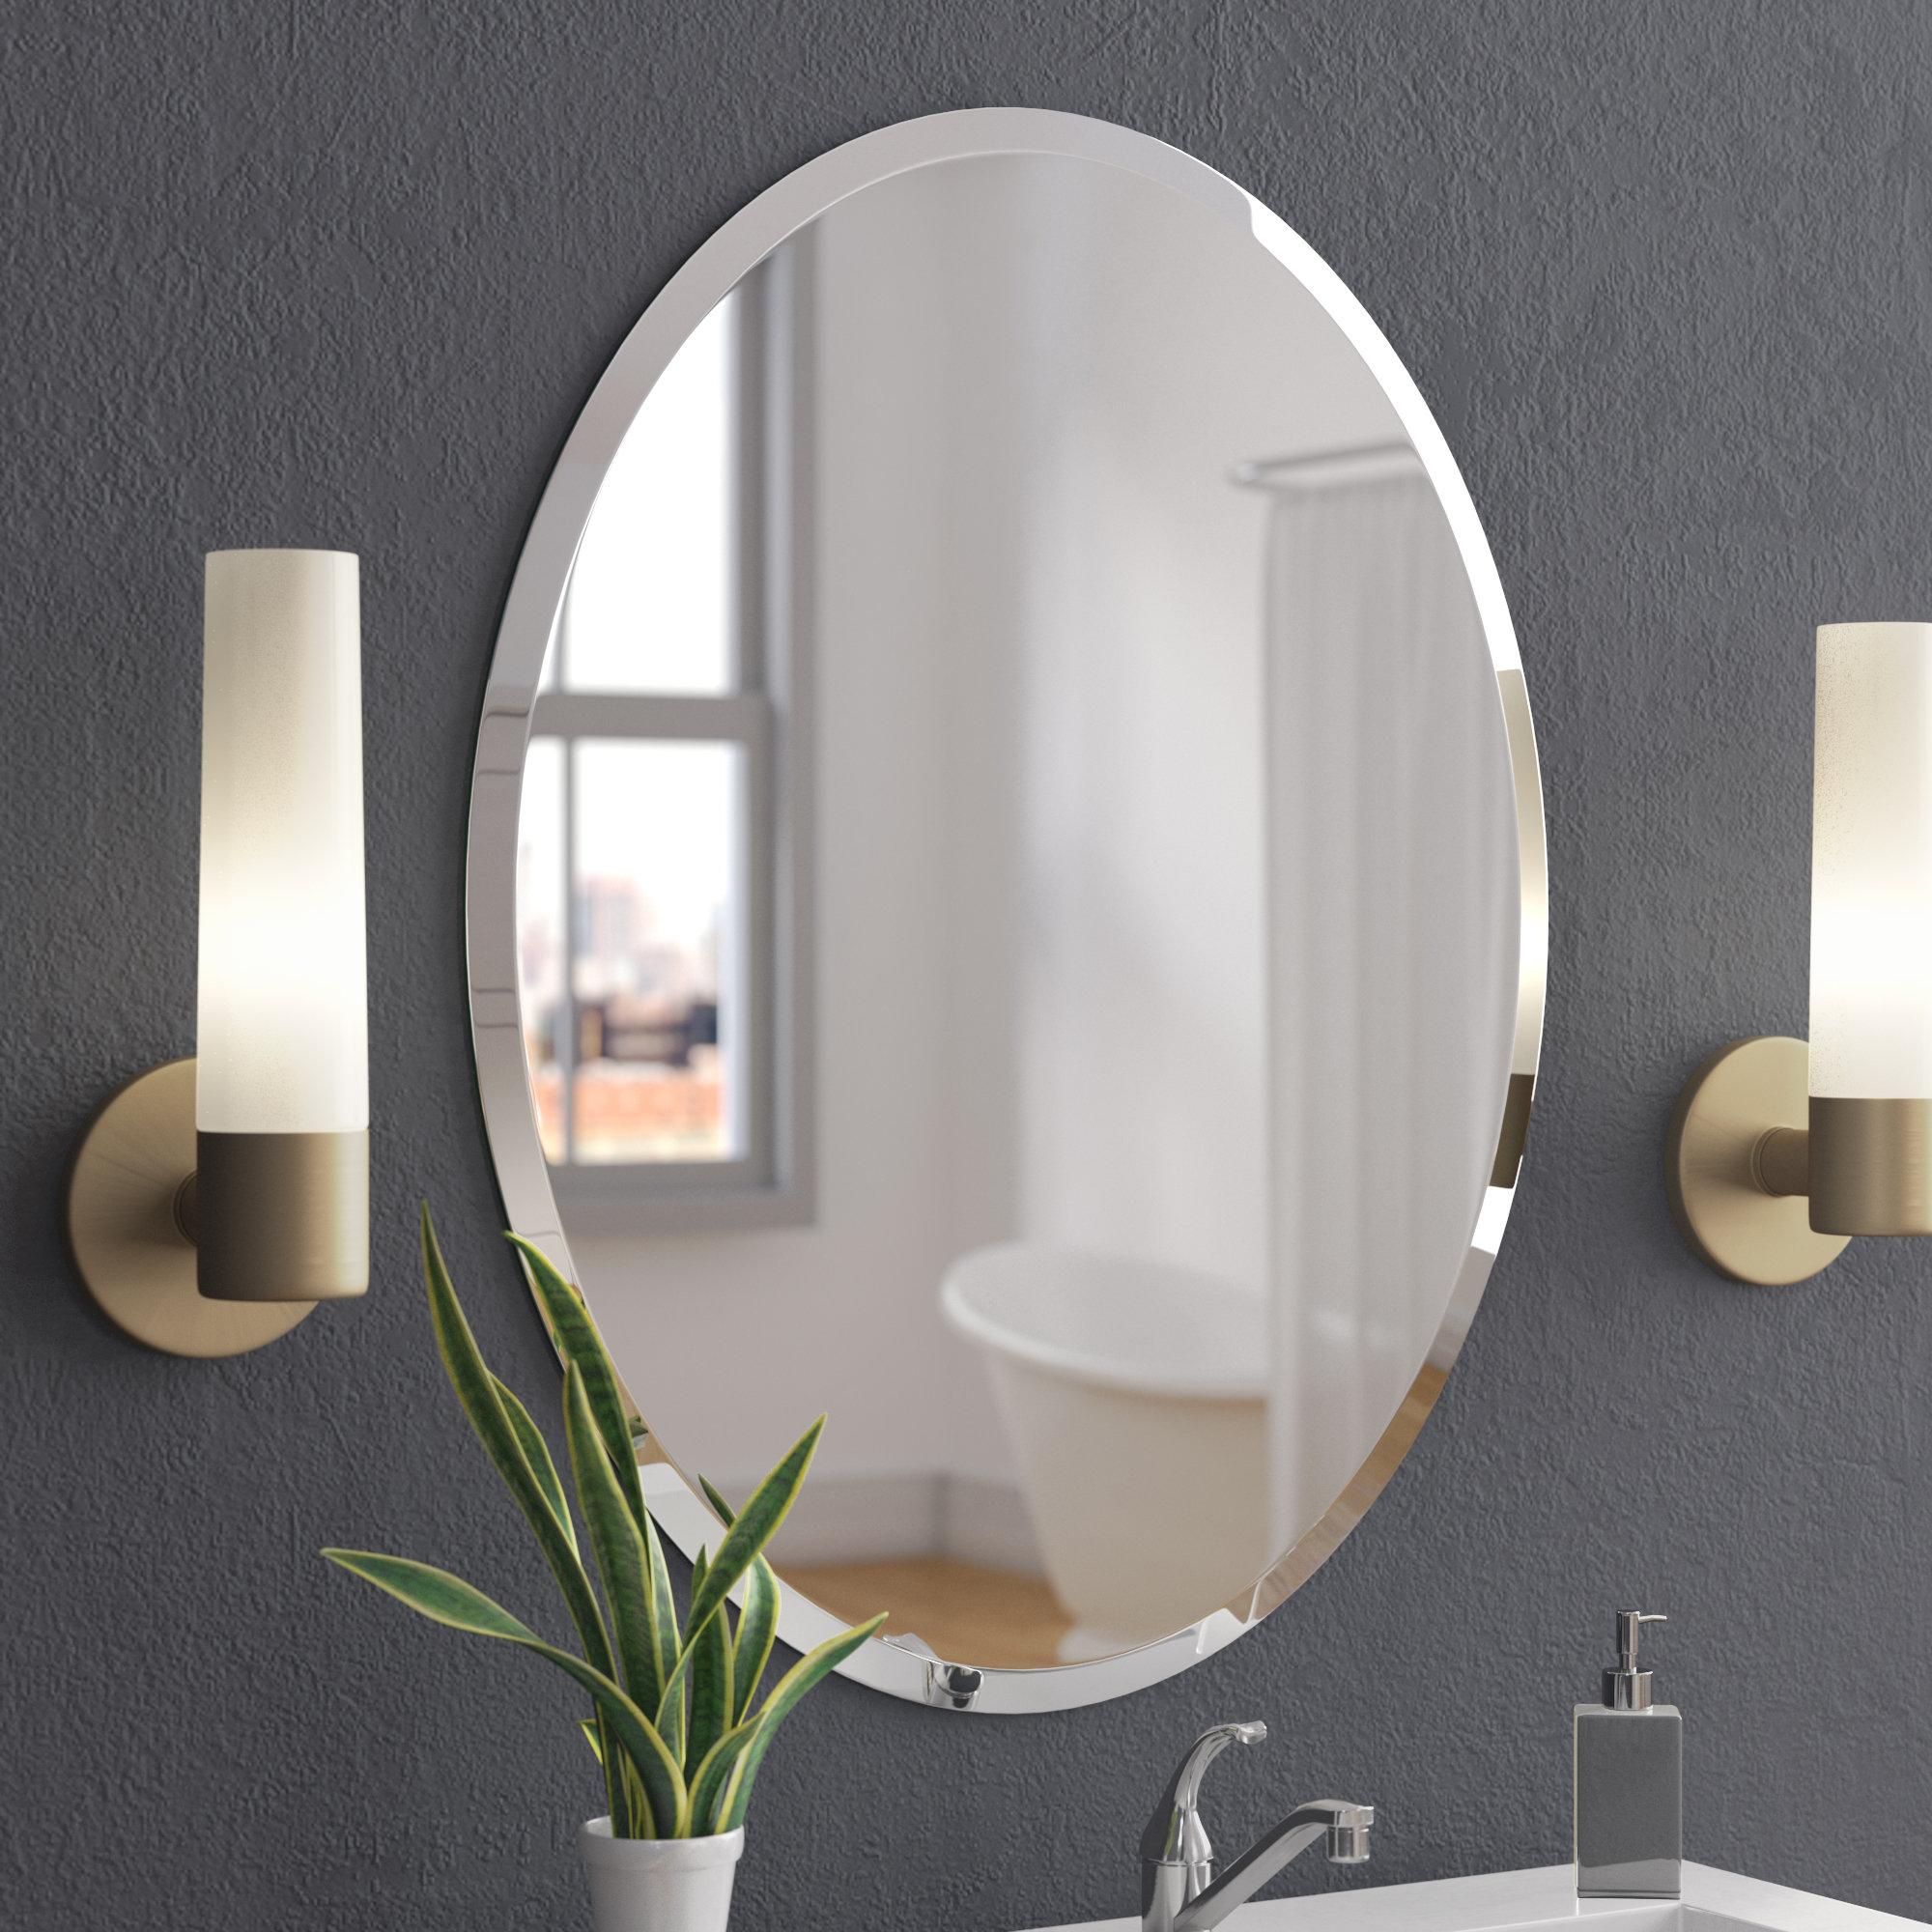 Callison Oval Bevel Frameless Wall Mirror